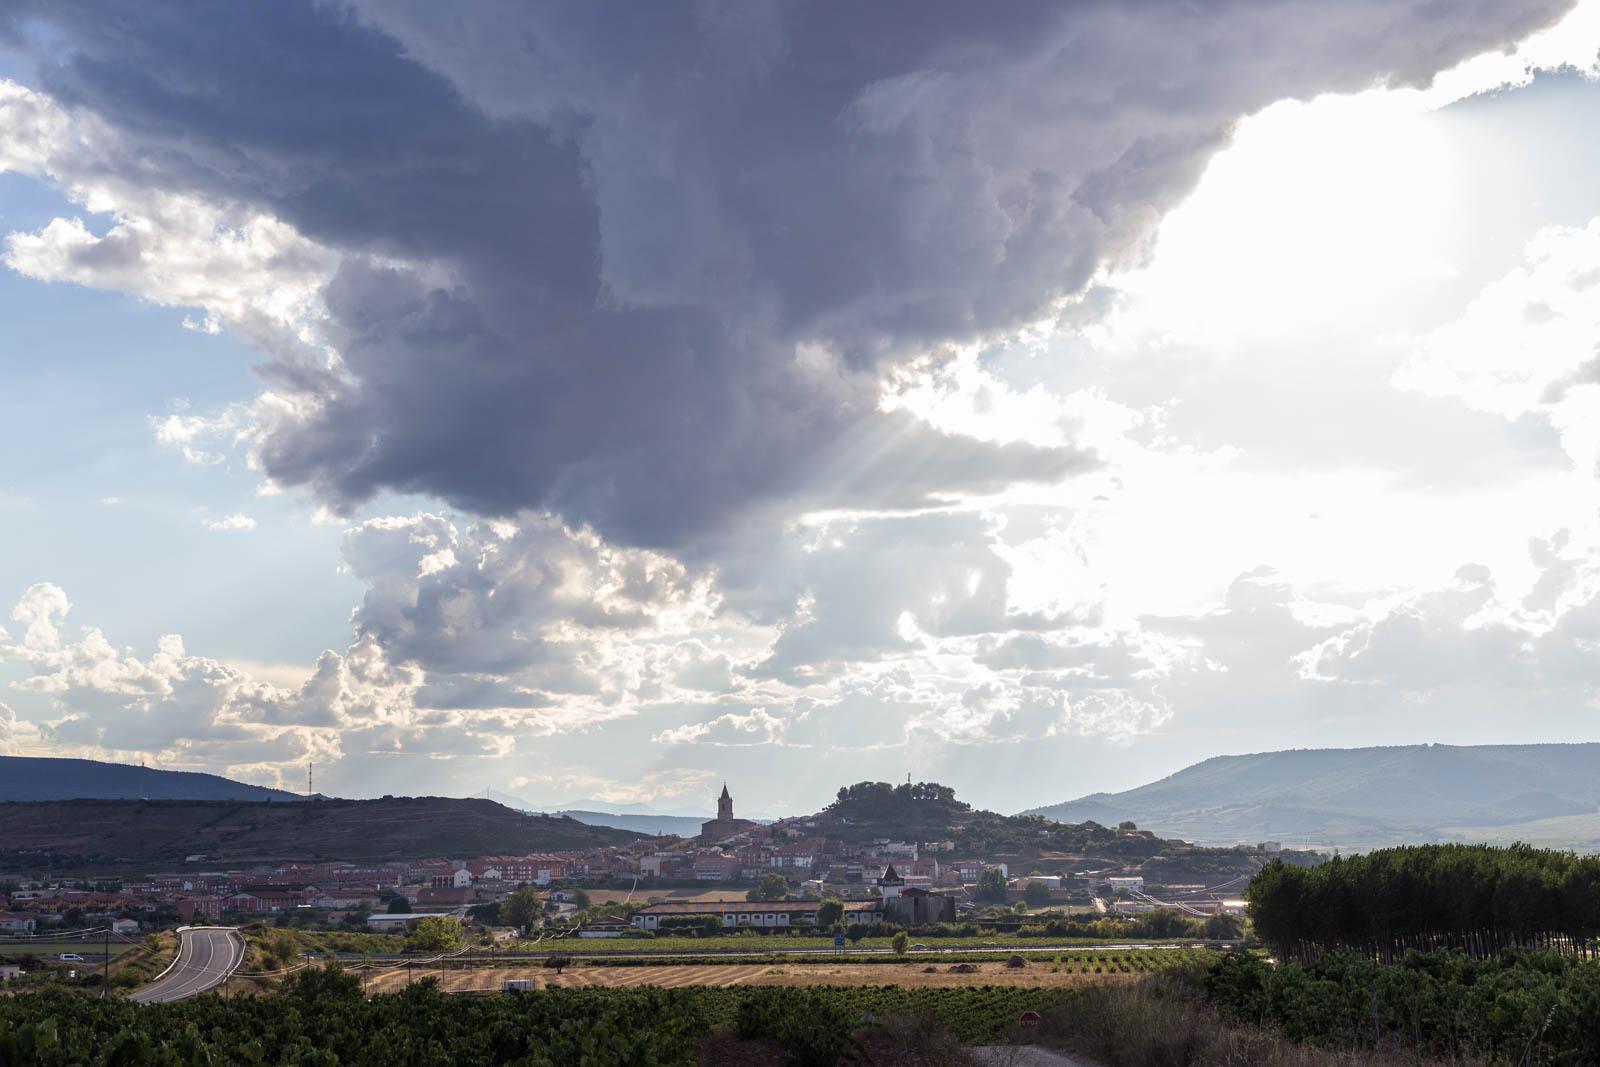 Yin Yang weather over Navarrete